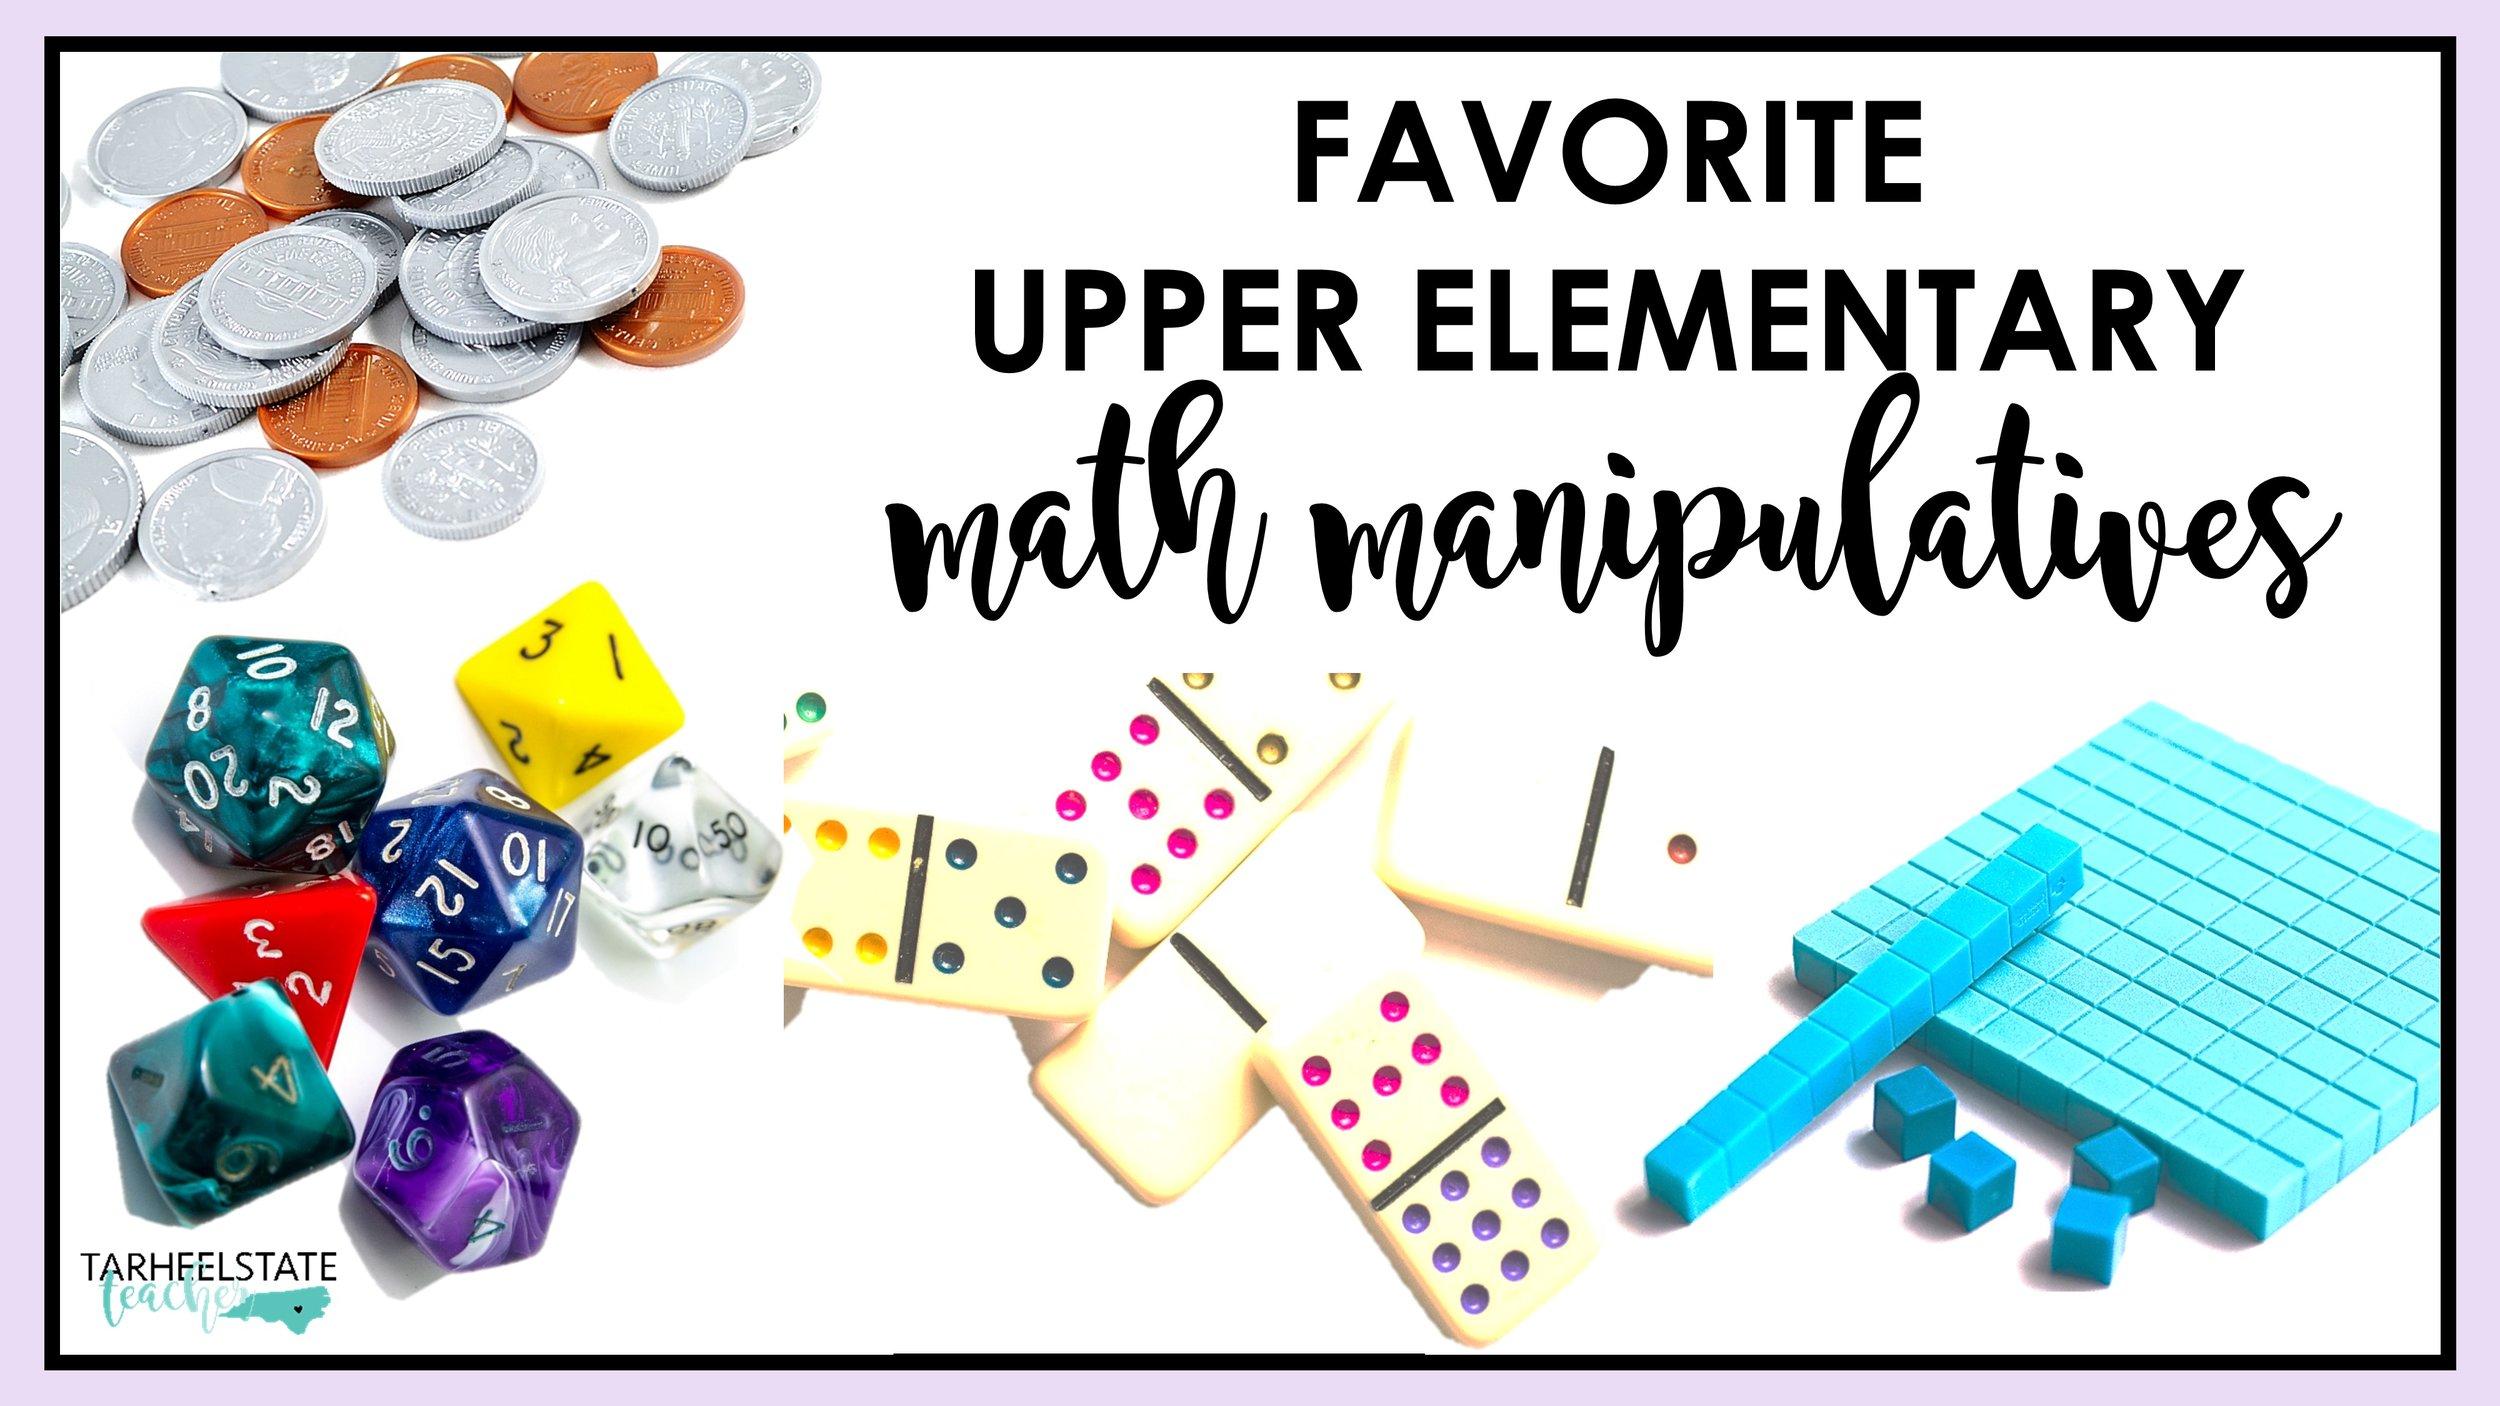 Favorite upper elementary math manipulatives.JPG